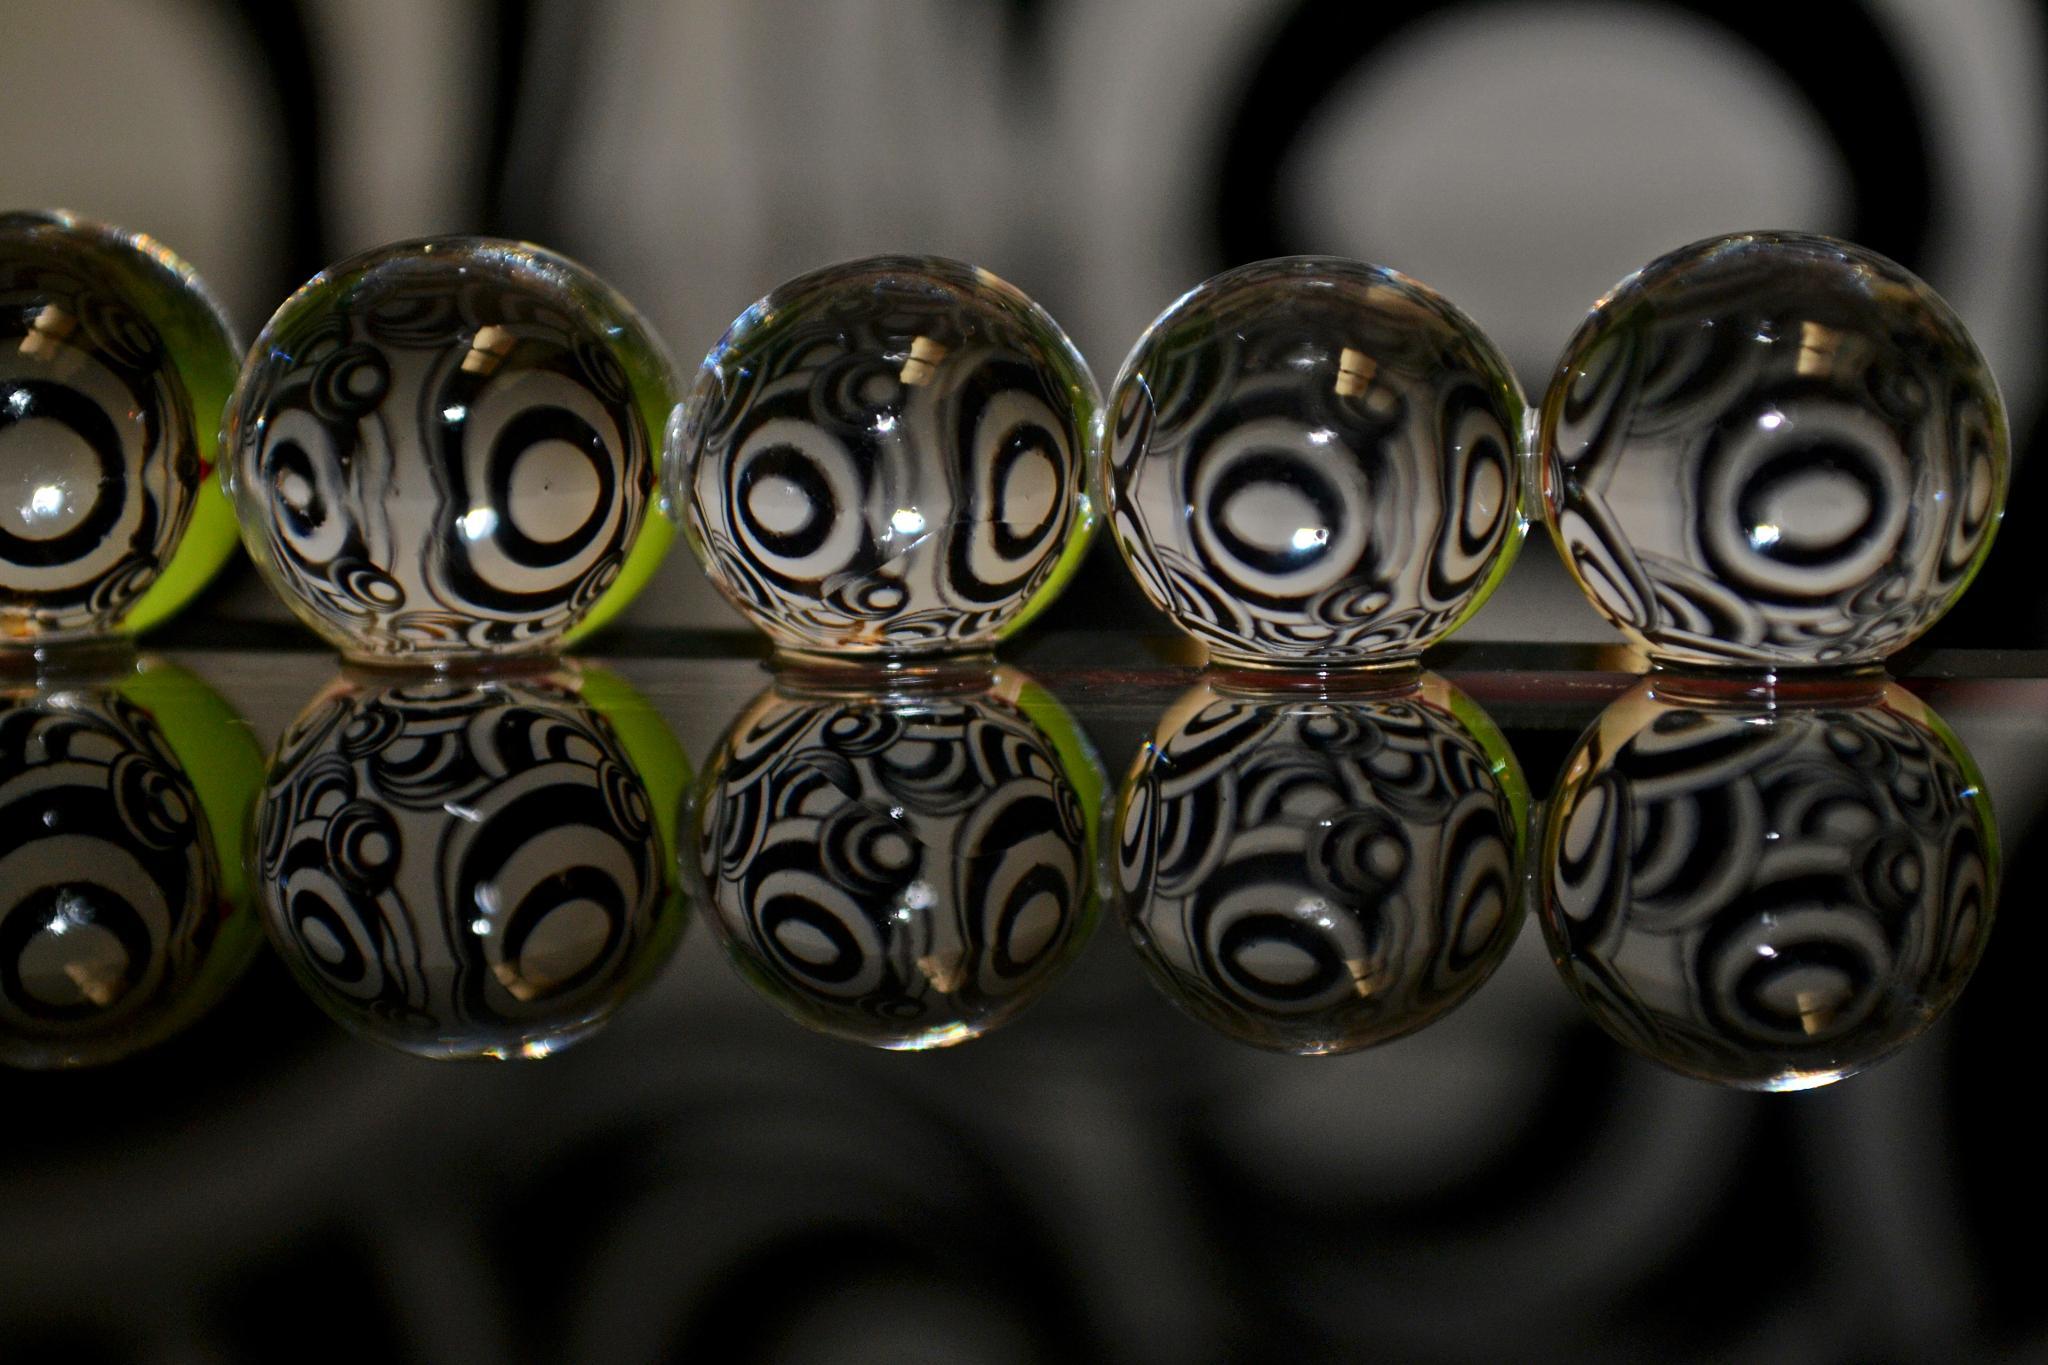 REFLECTIONS by yakolaverde